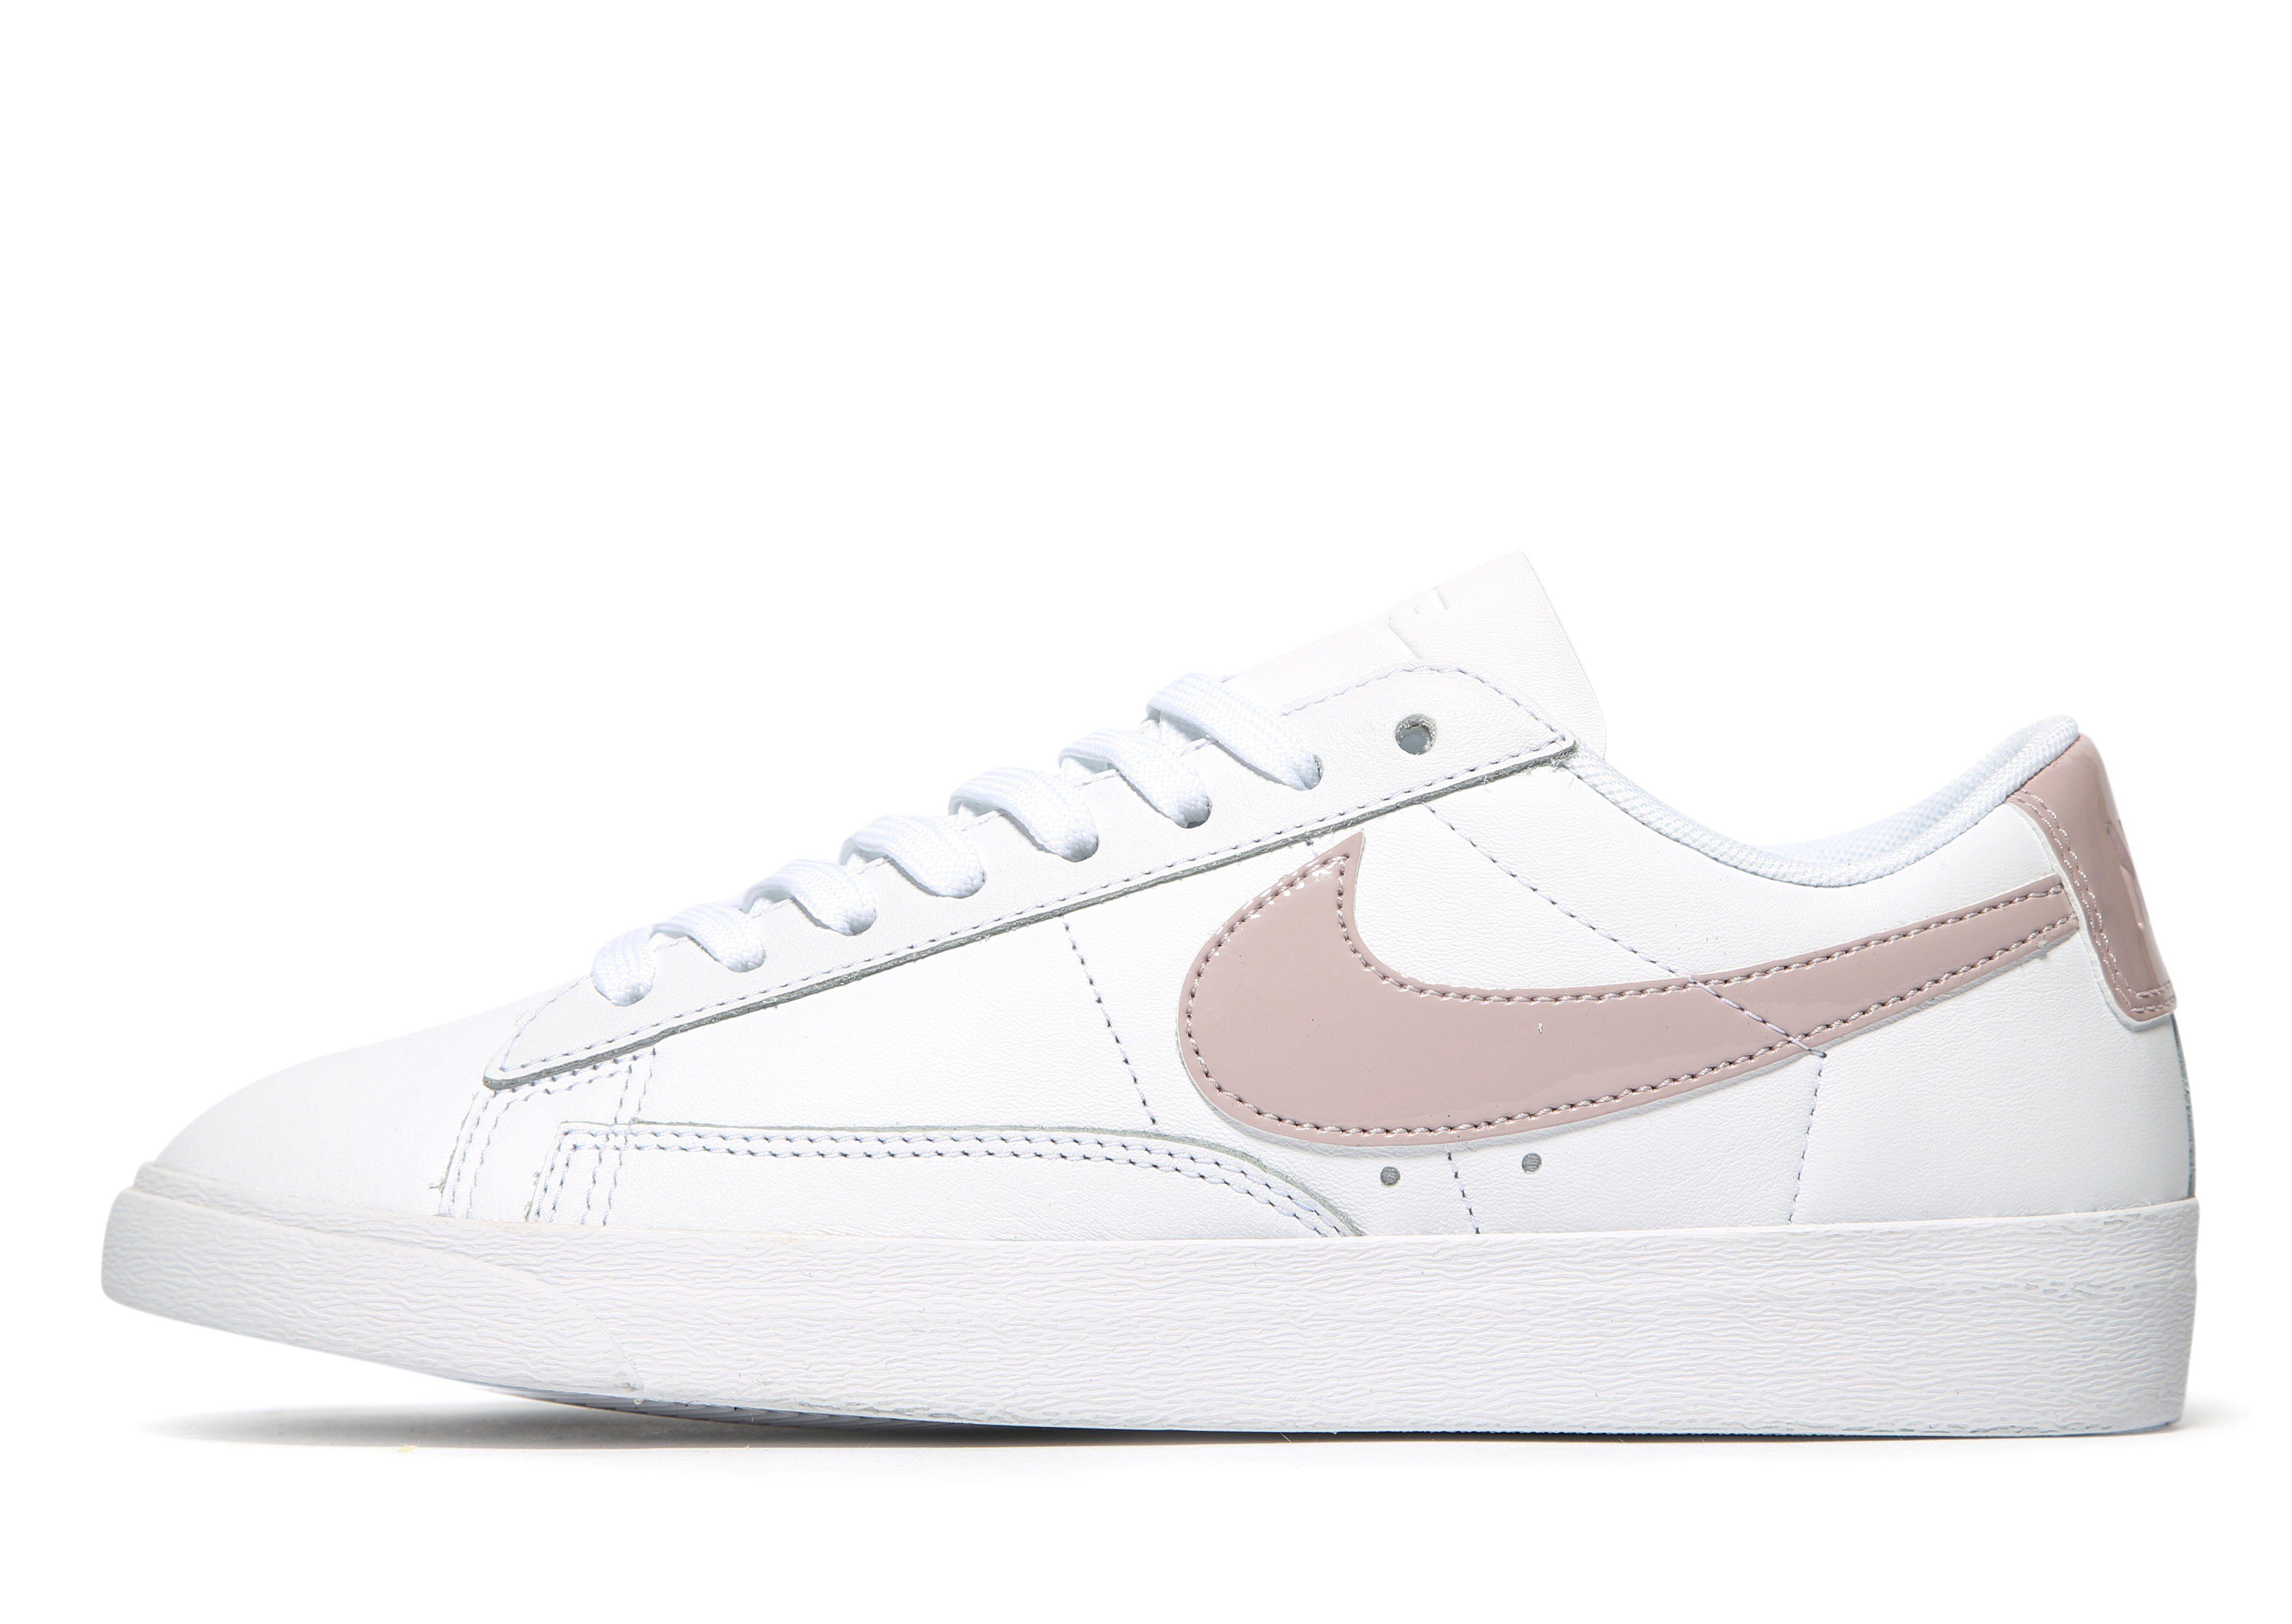 Nike Blazer Low LE Women's Shop online for Nike Blazer Low